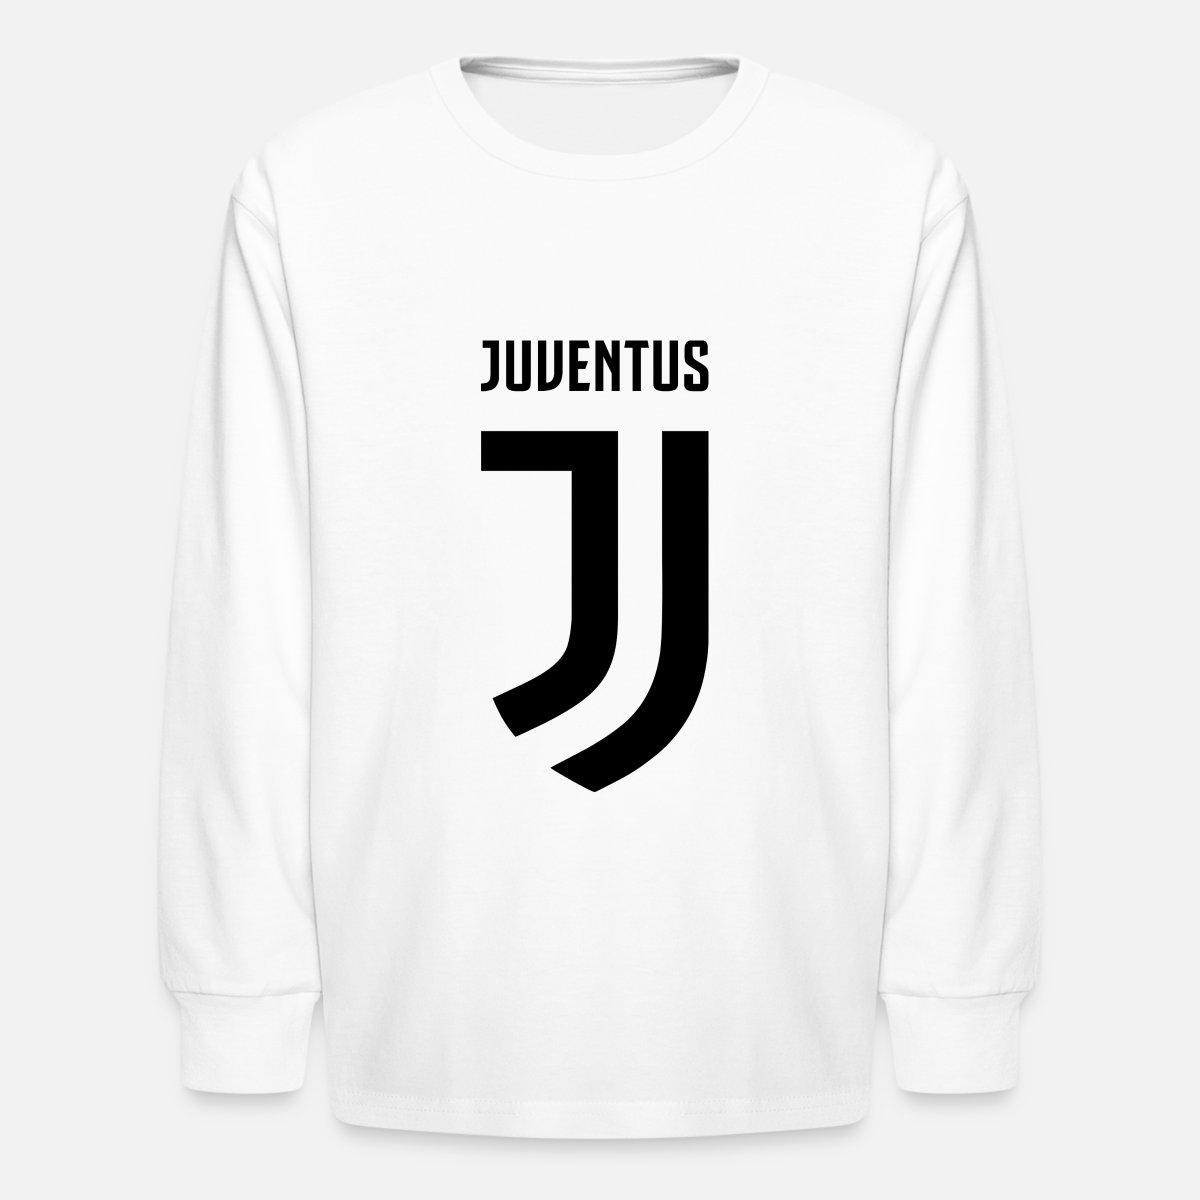 afb971d06db juve new logo Kids  Longsleeve Shirt